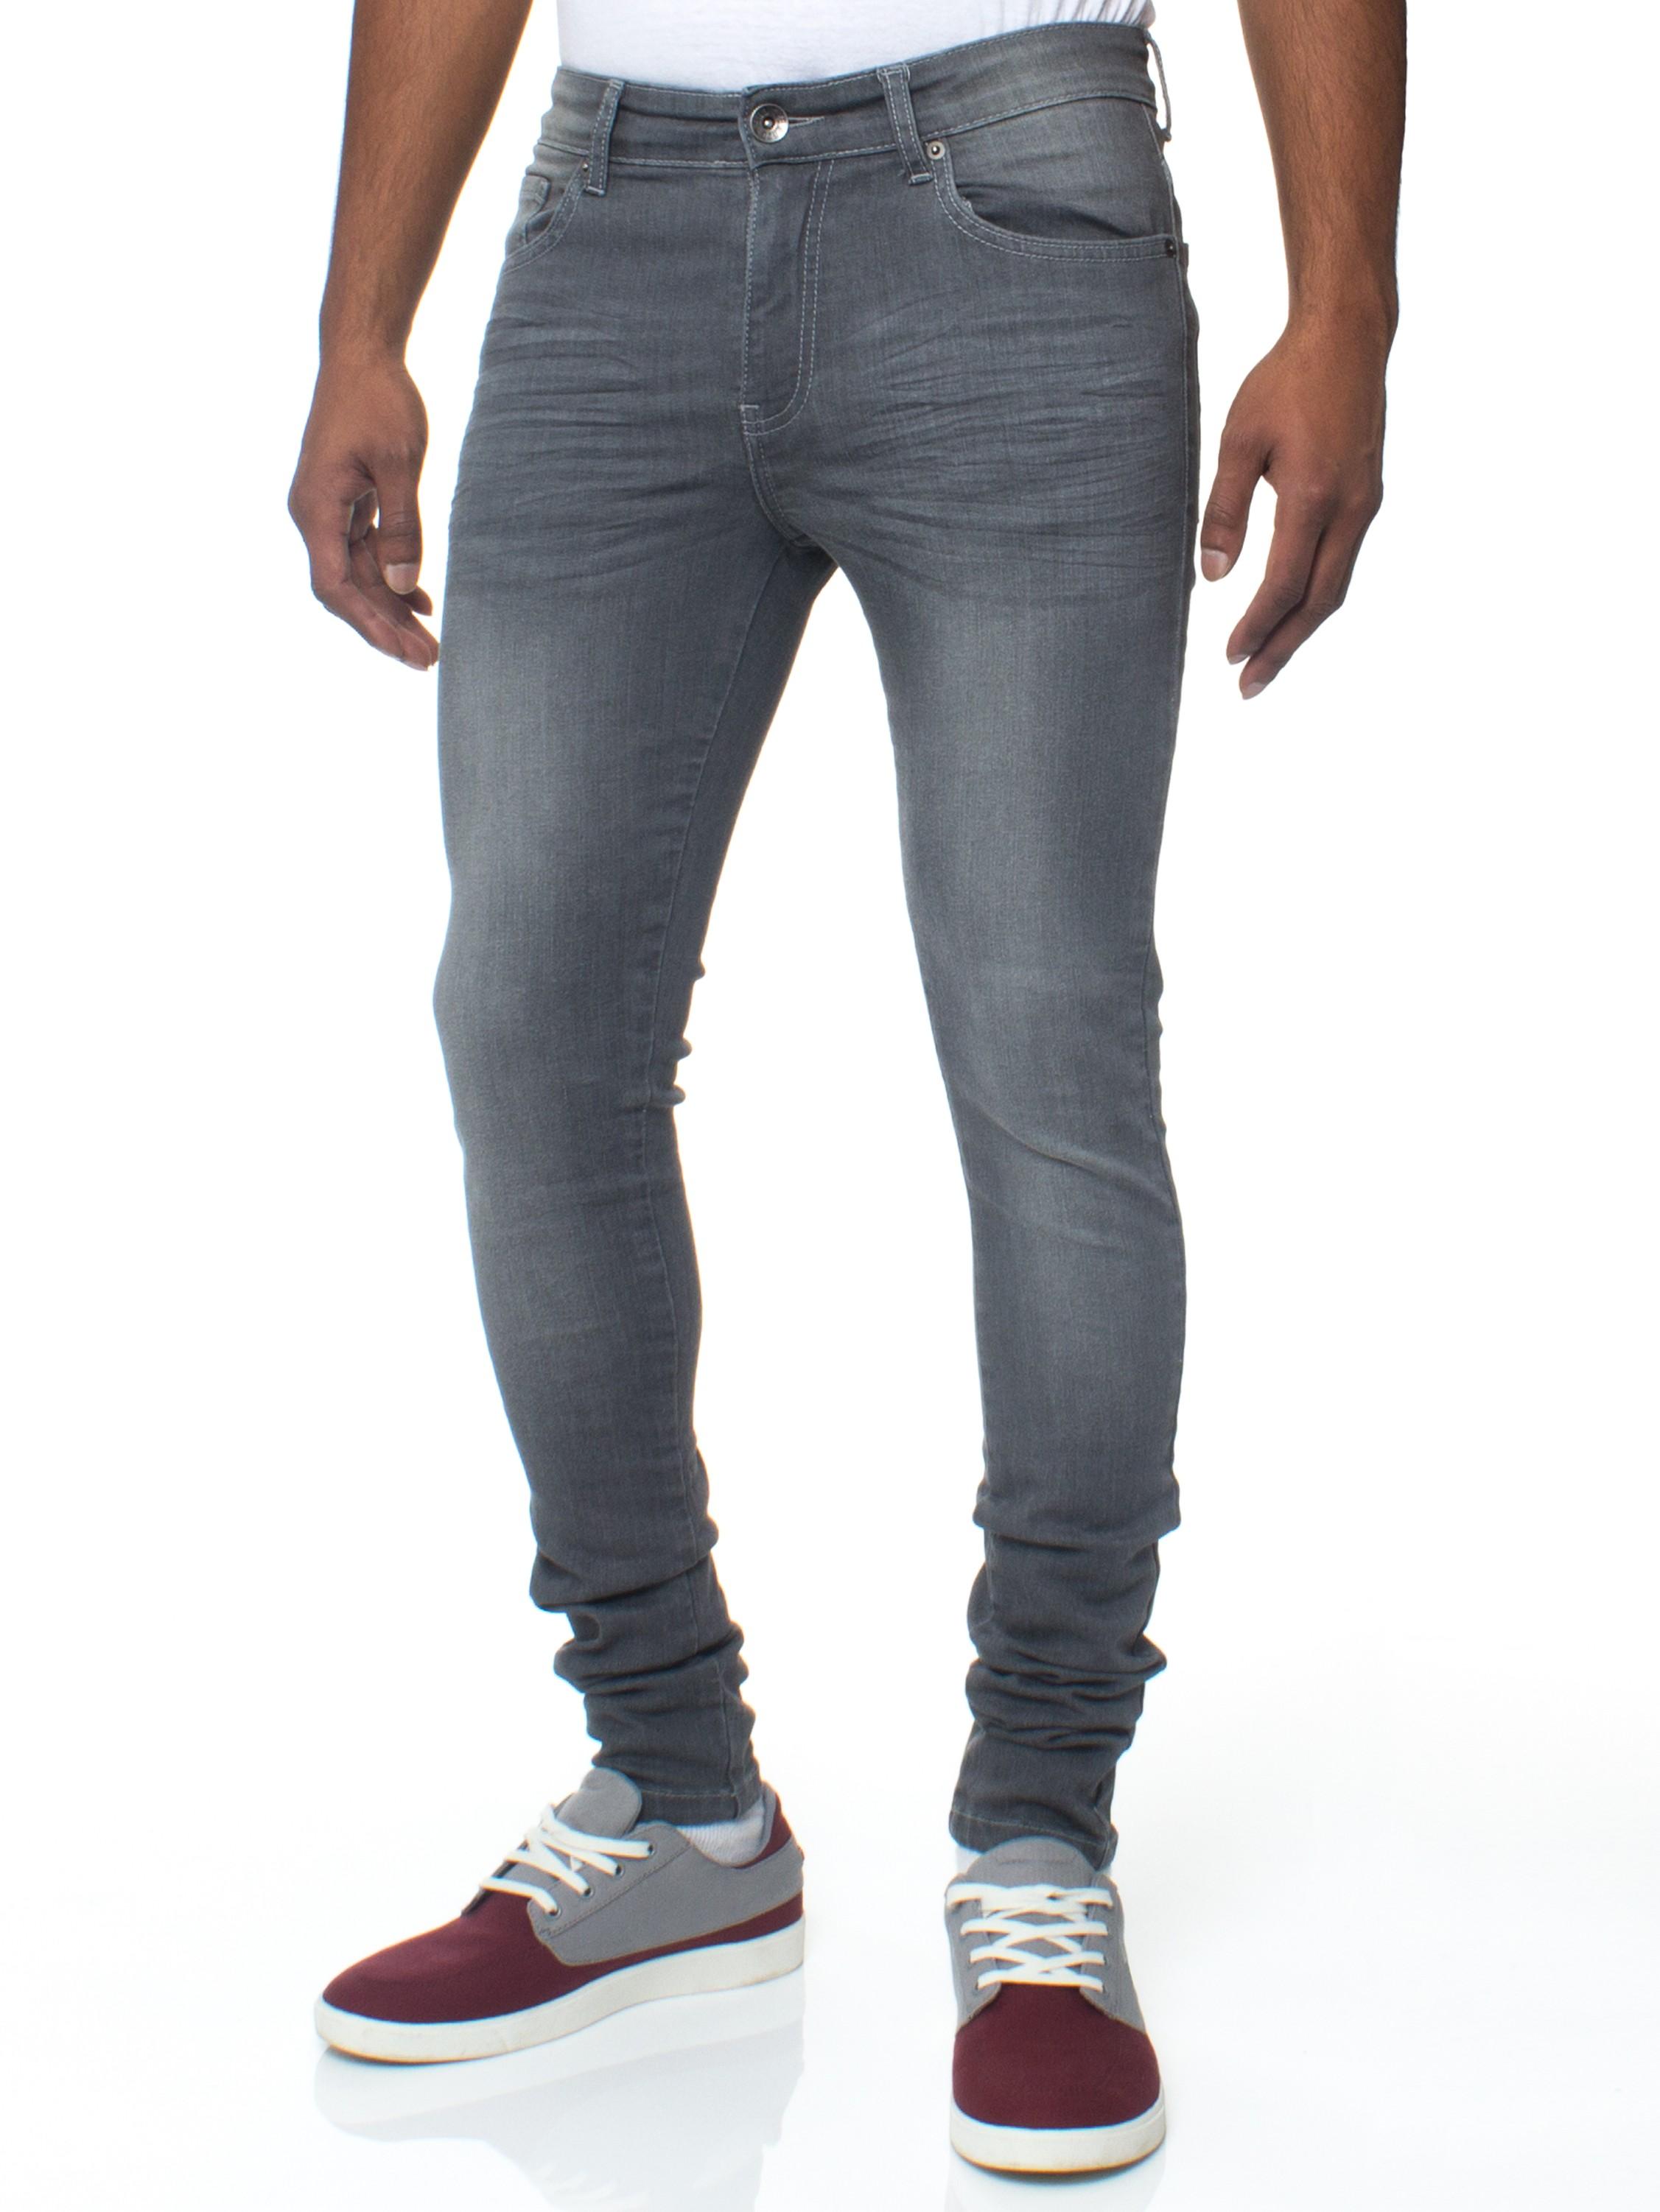 mens stretch jeans mens skinny slim fit stretch grey jeans rjfunko